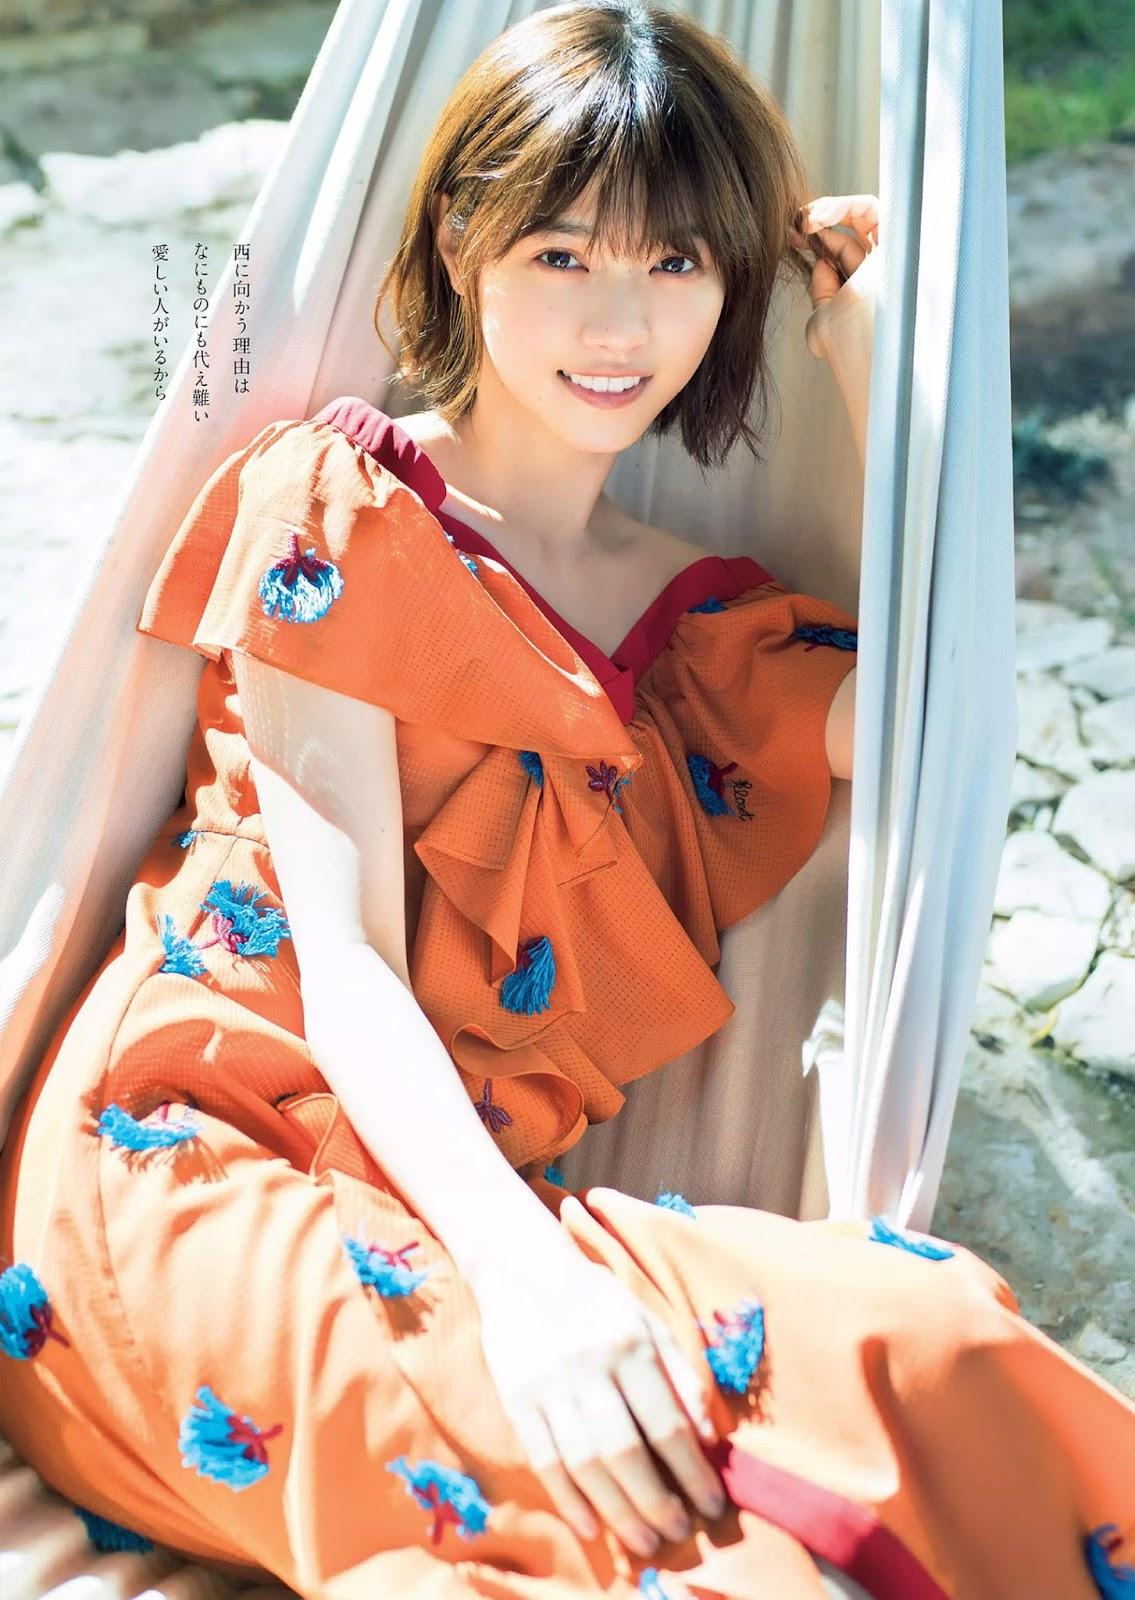 Nishino Nanase 西野七瀬, Weekly Playboy 2018 No.19-20 (週刊プレイボーイ 2018年19-20号)